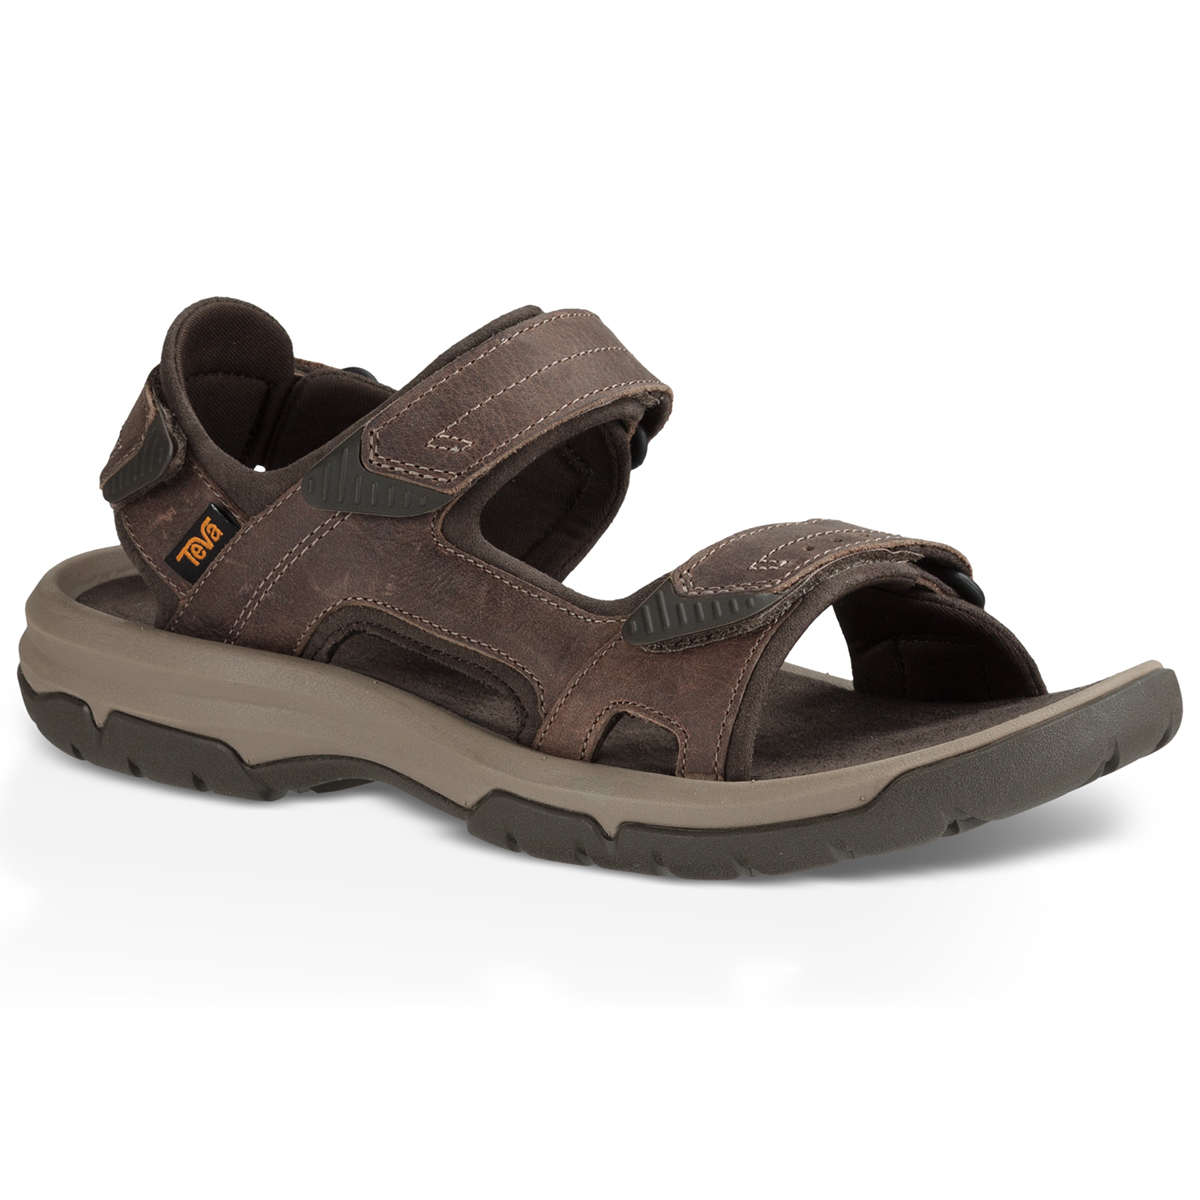 Teva Men's Langdon Sandals - Brown, 10